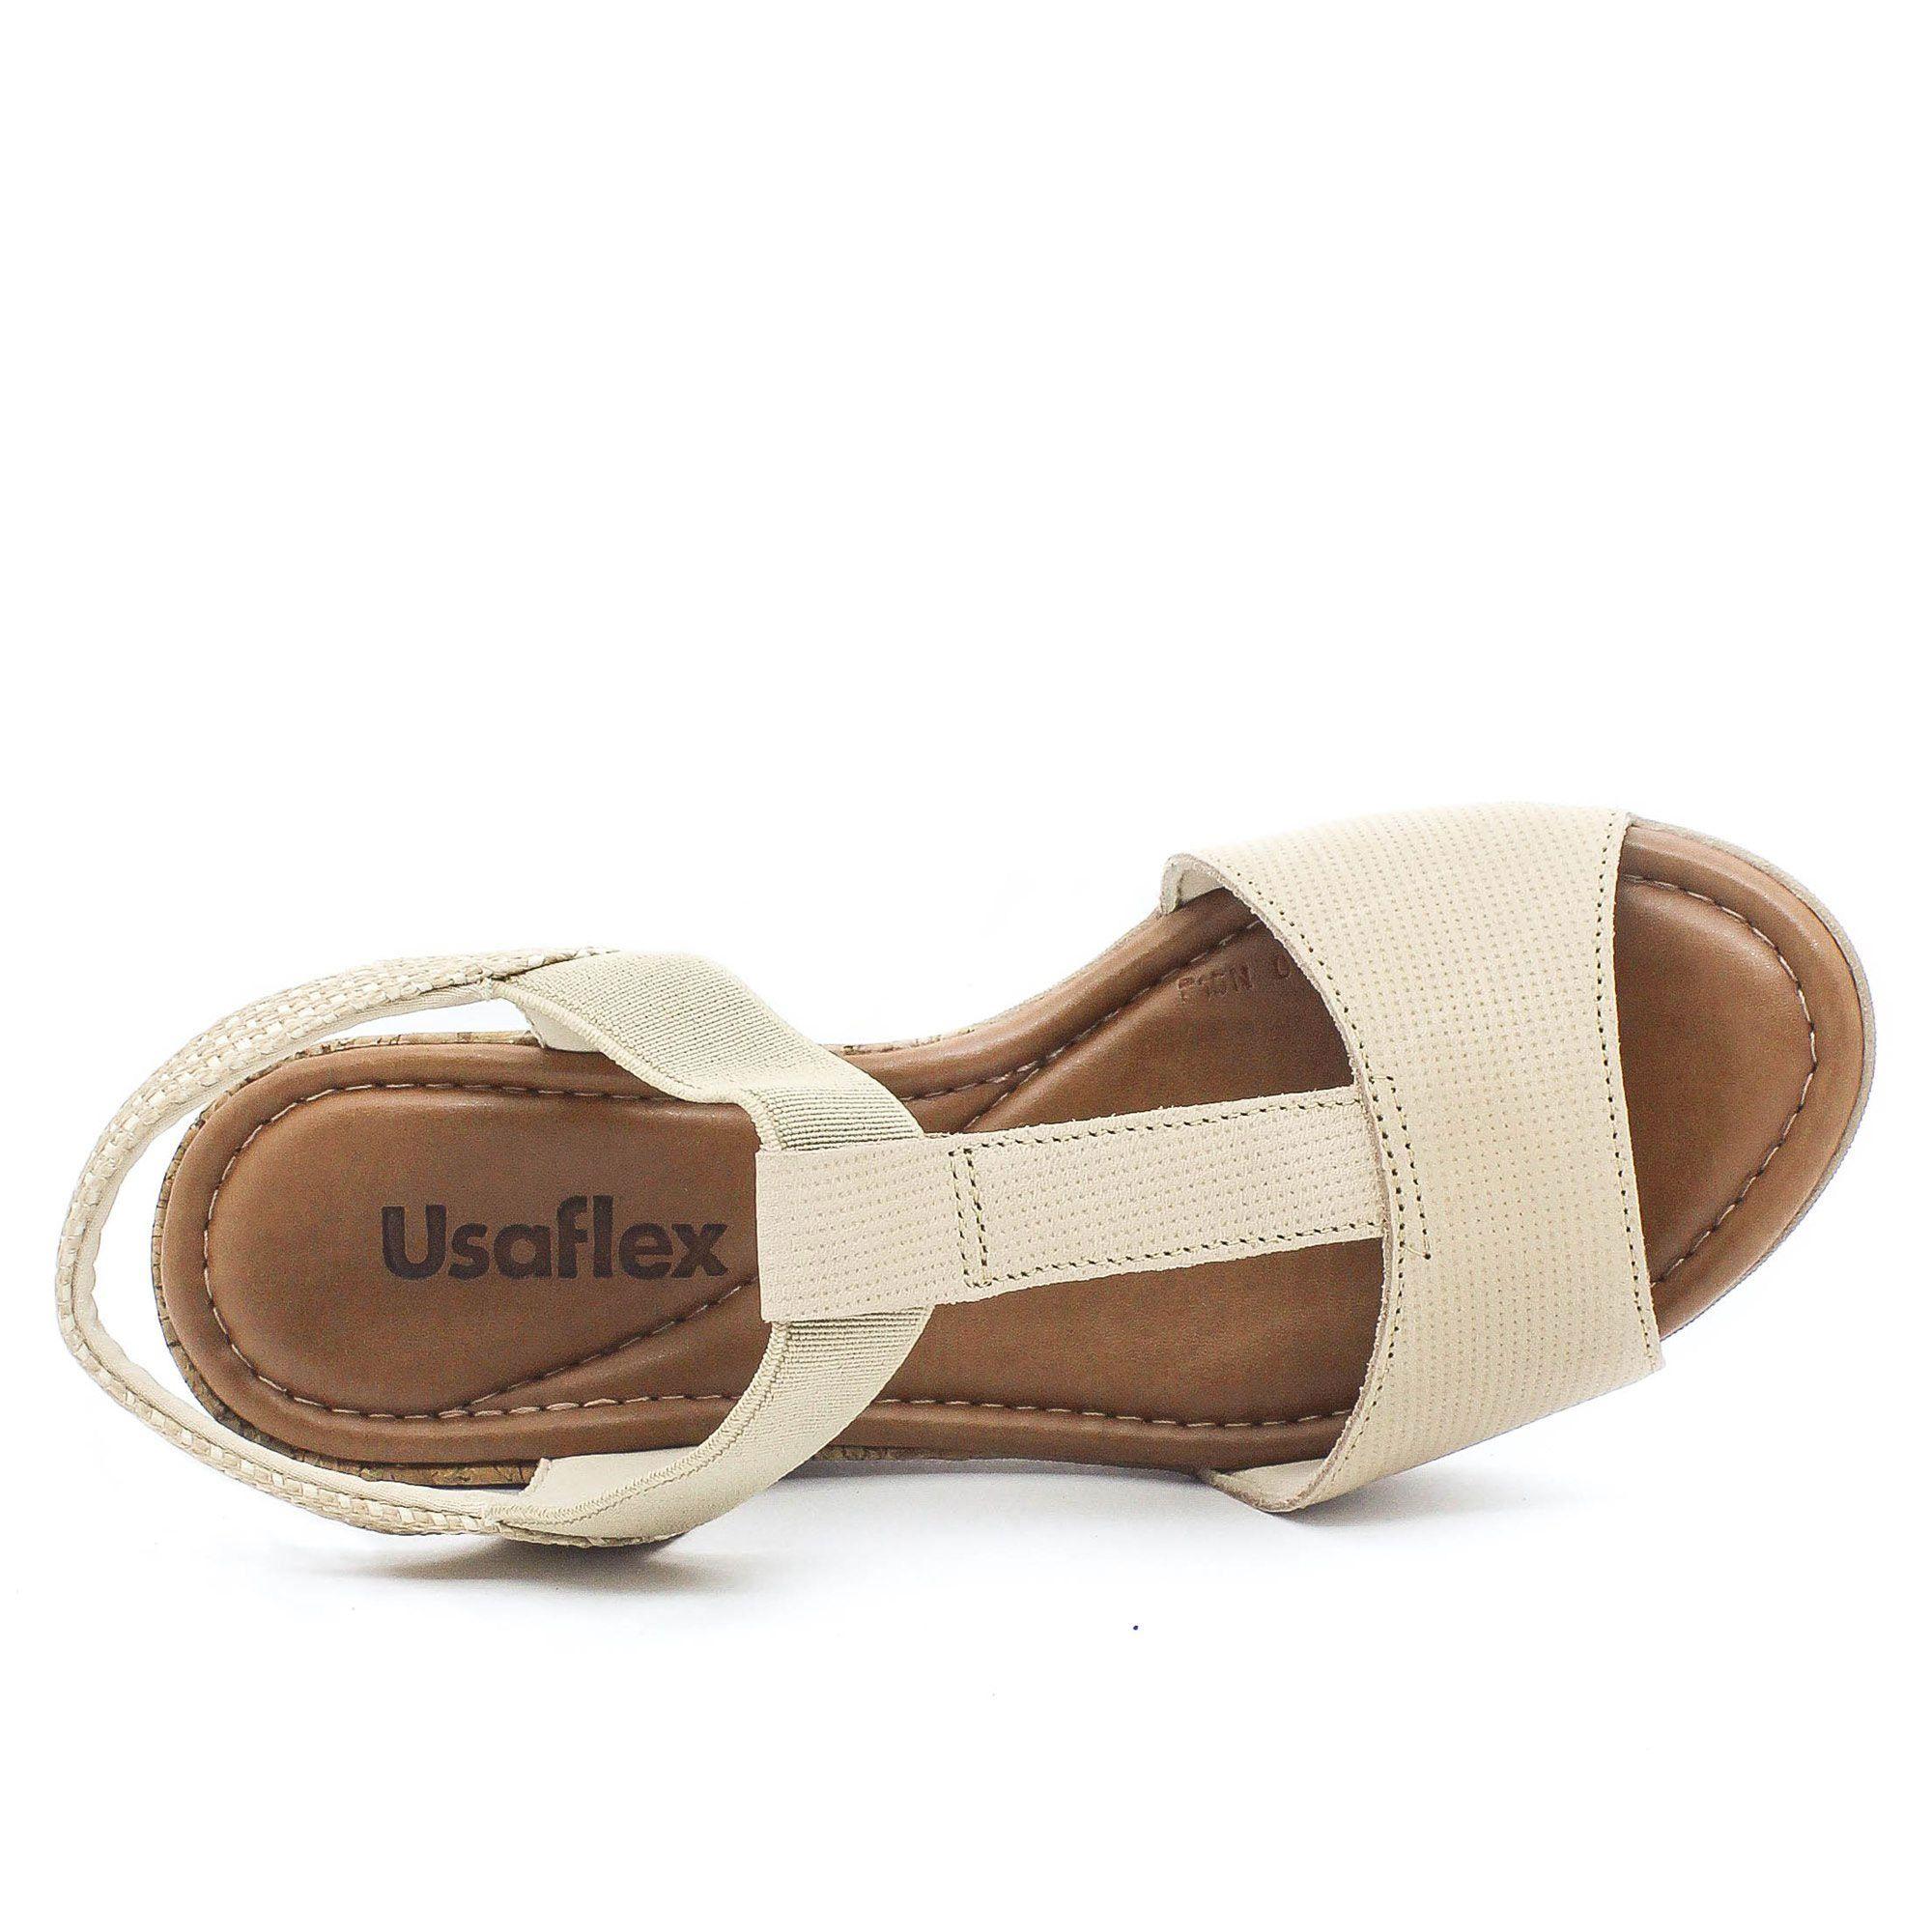 Usaflex Sandália Confort Bege